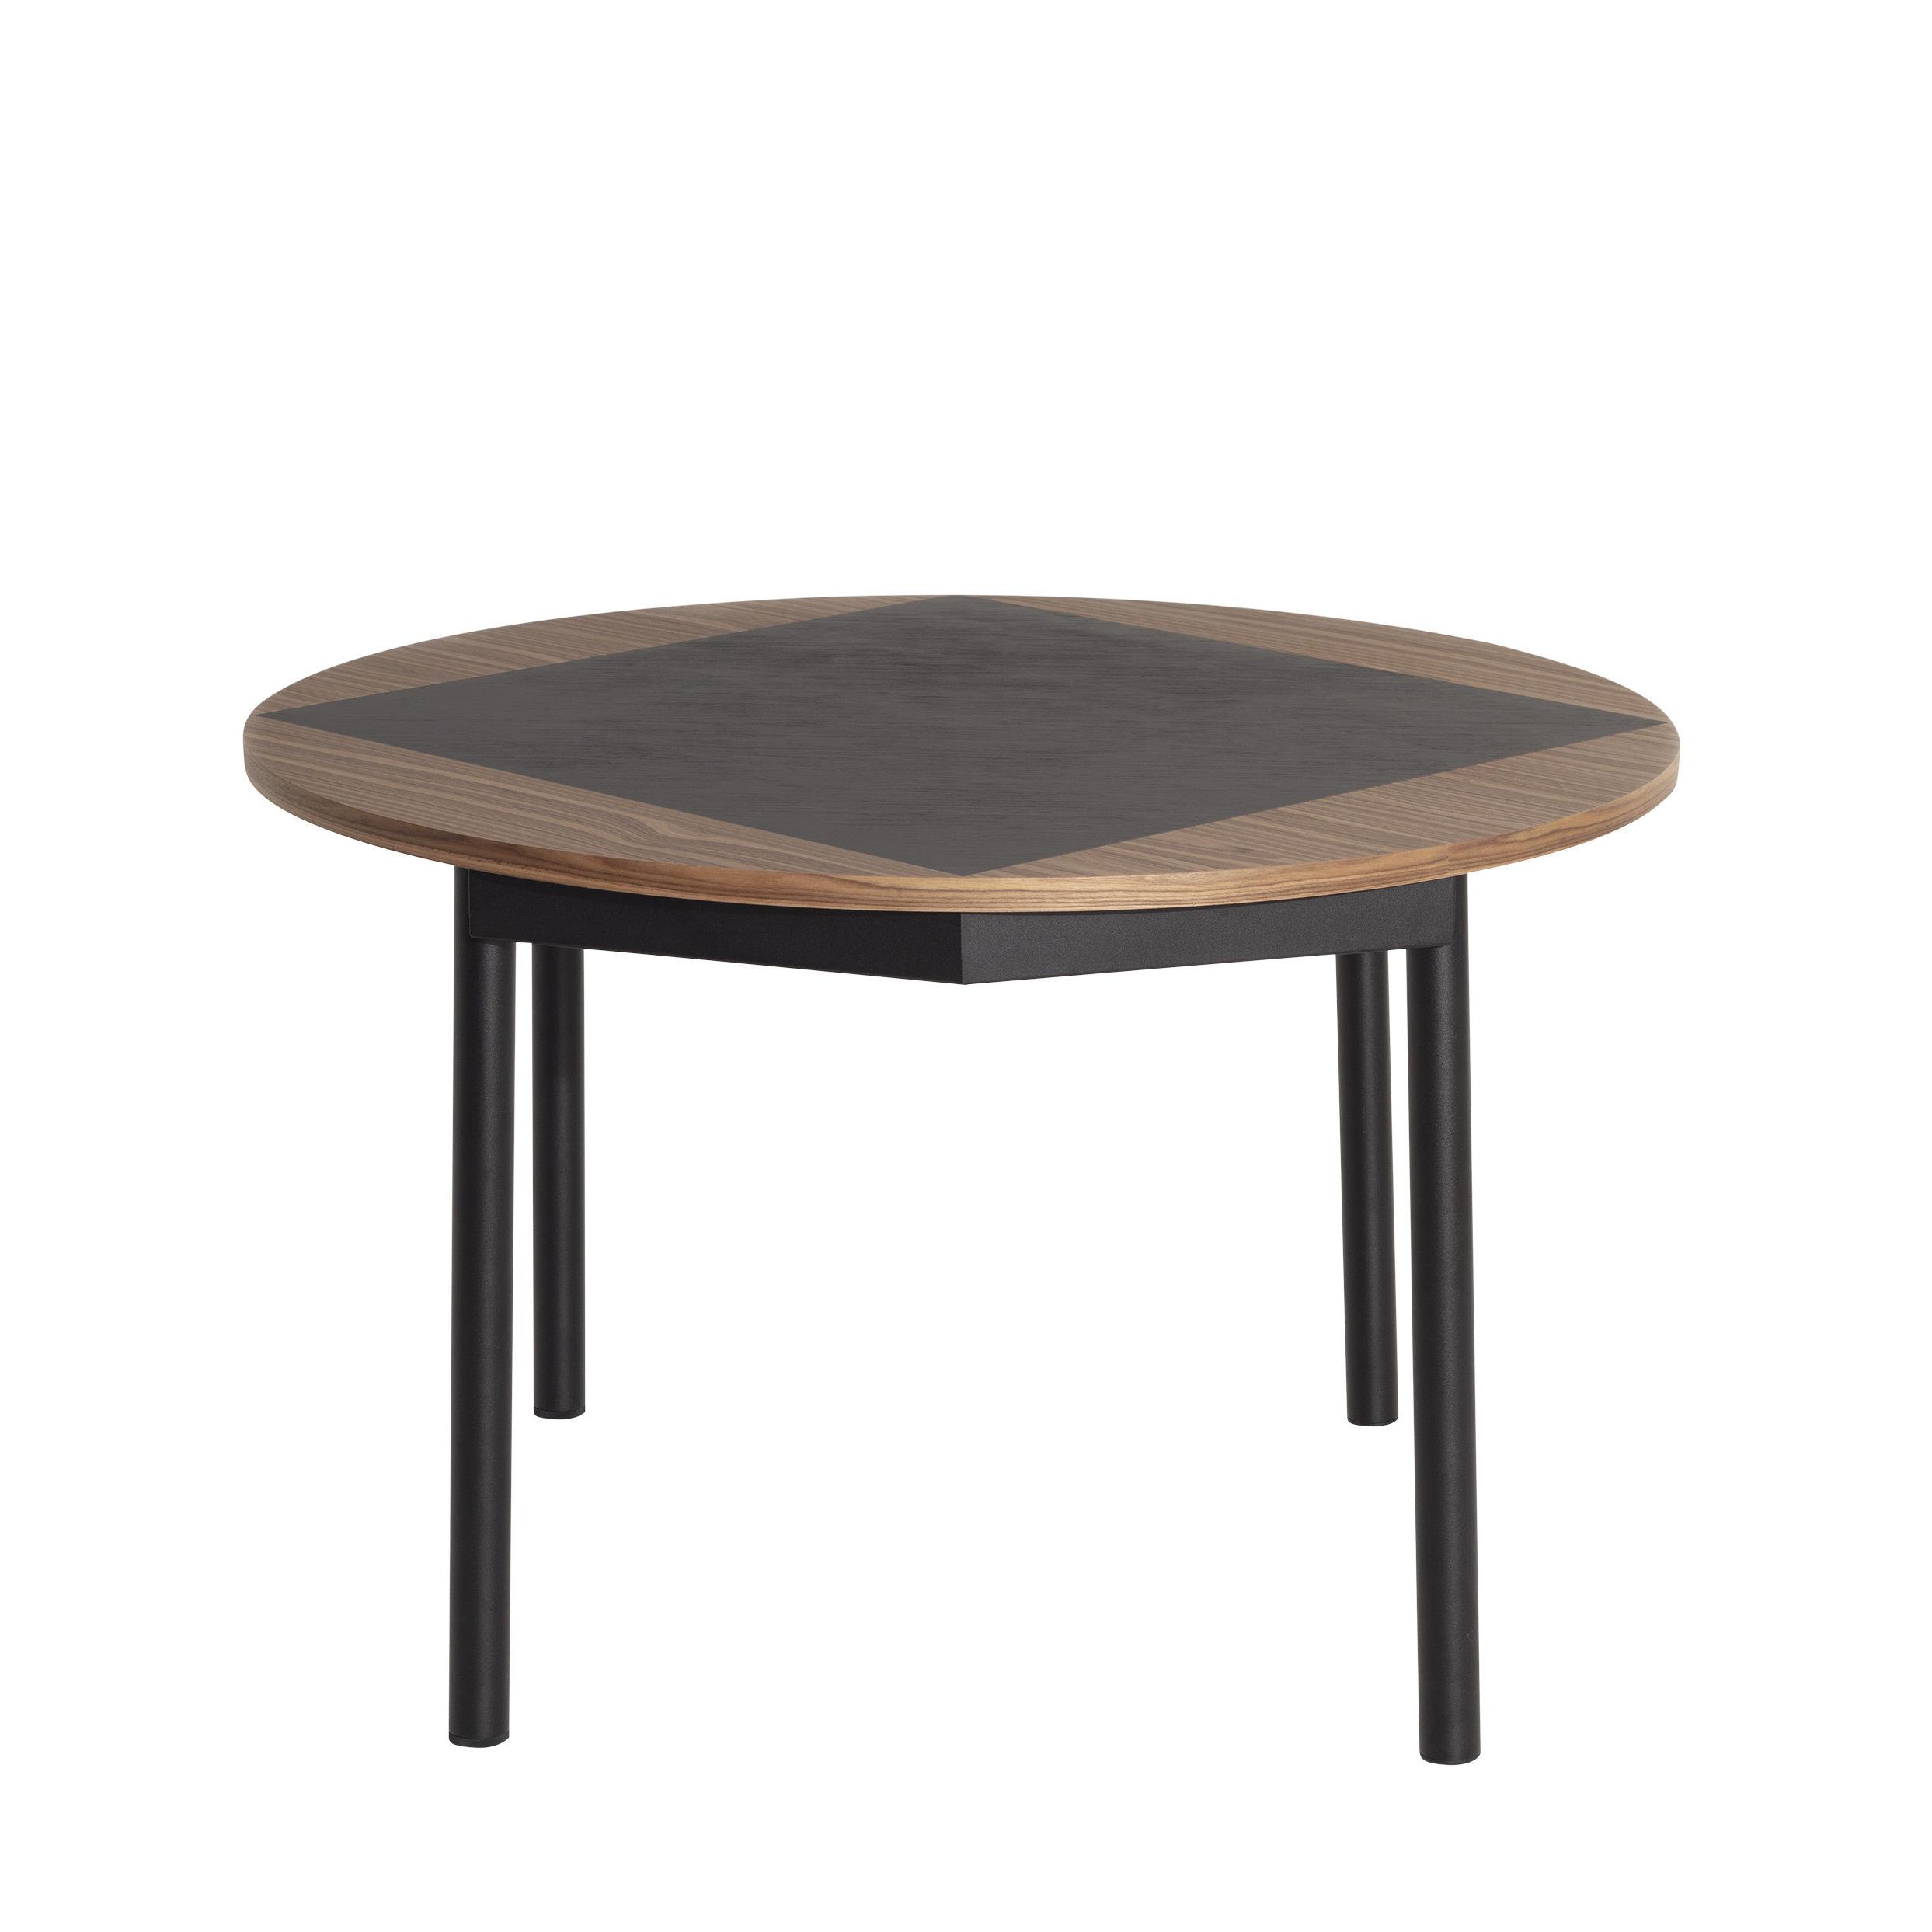 Furniture - Dining Tables - Tavla Round table - / Ø 120 cm - Walnut inlay by Petite Friture - Walnut & black - Lacquered steel, Walnut